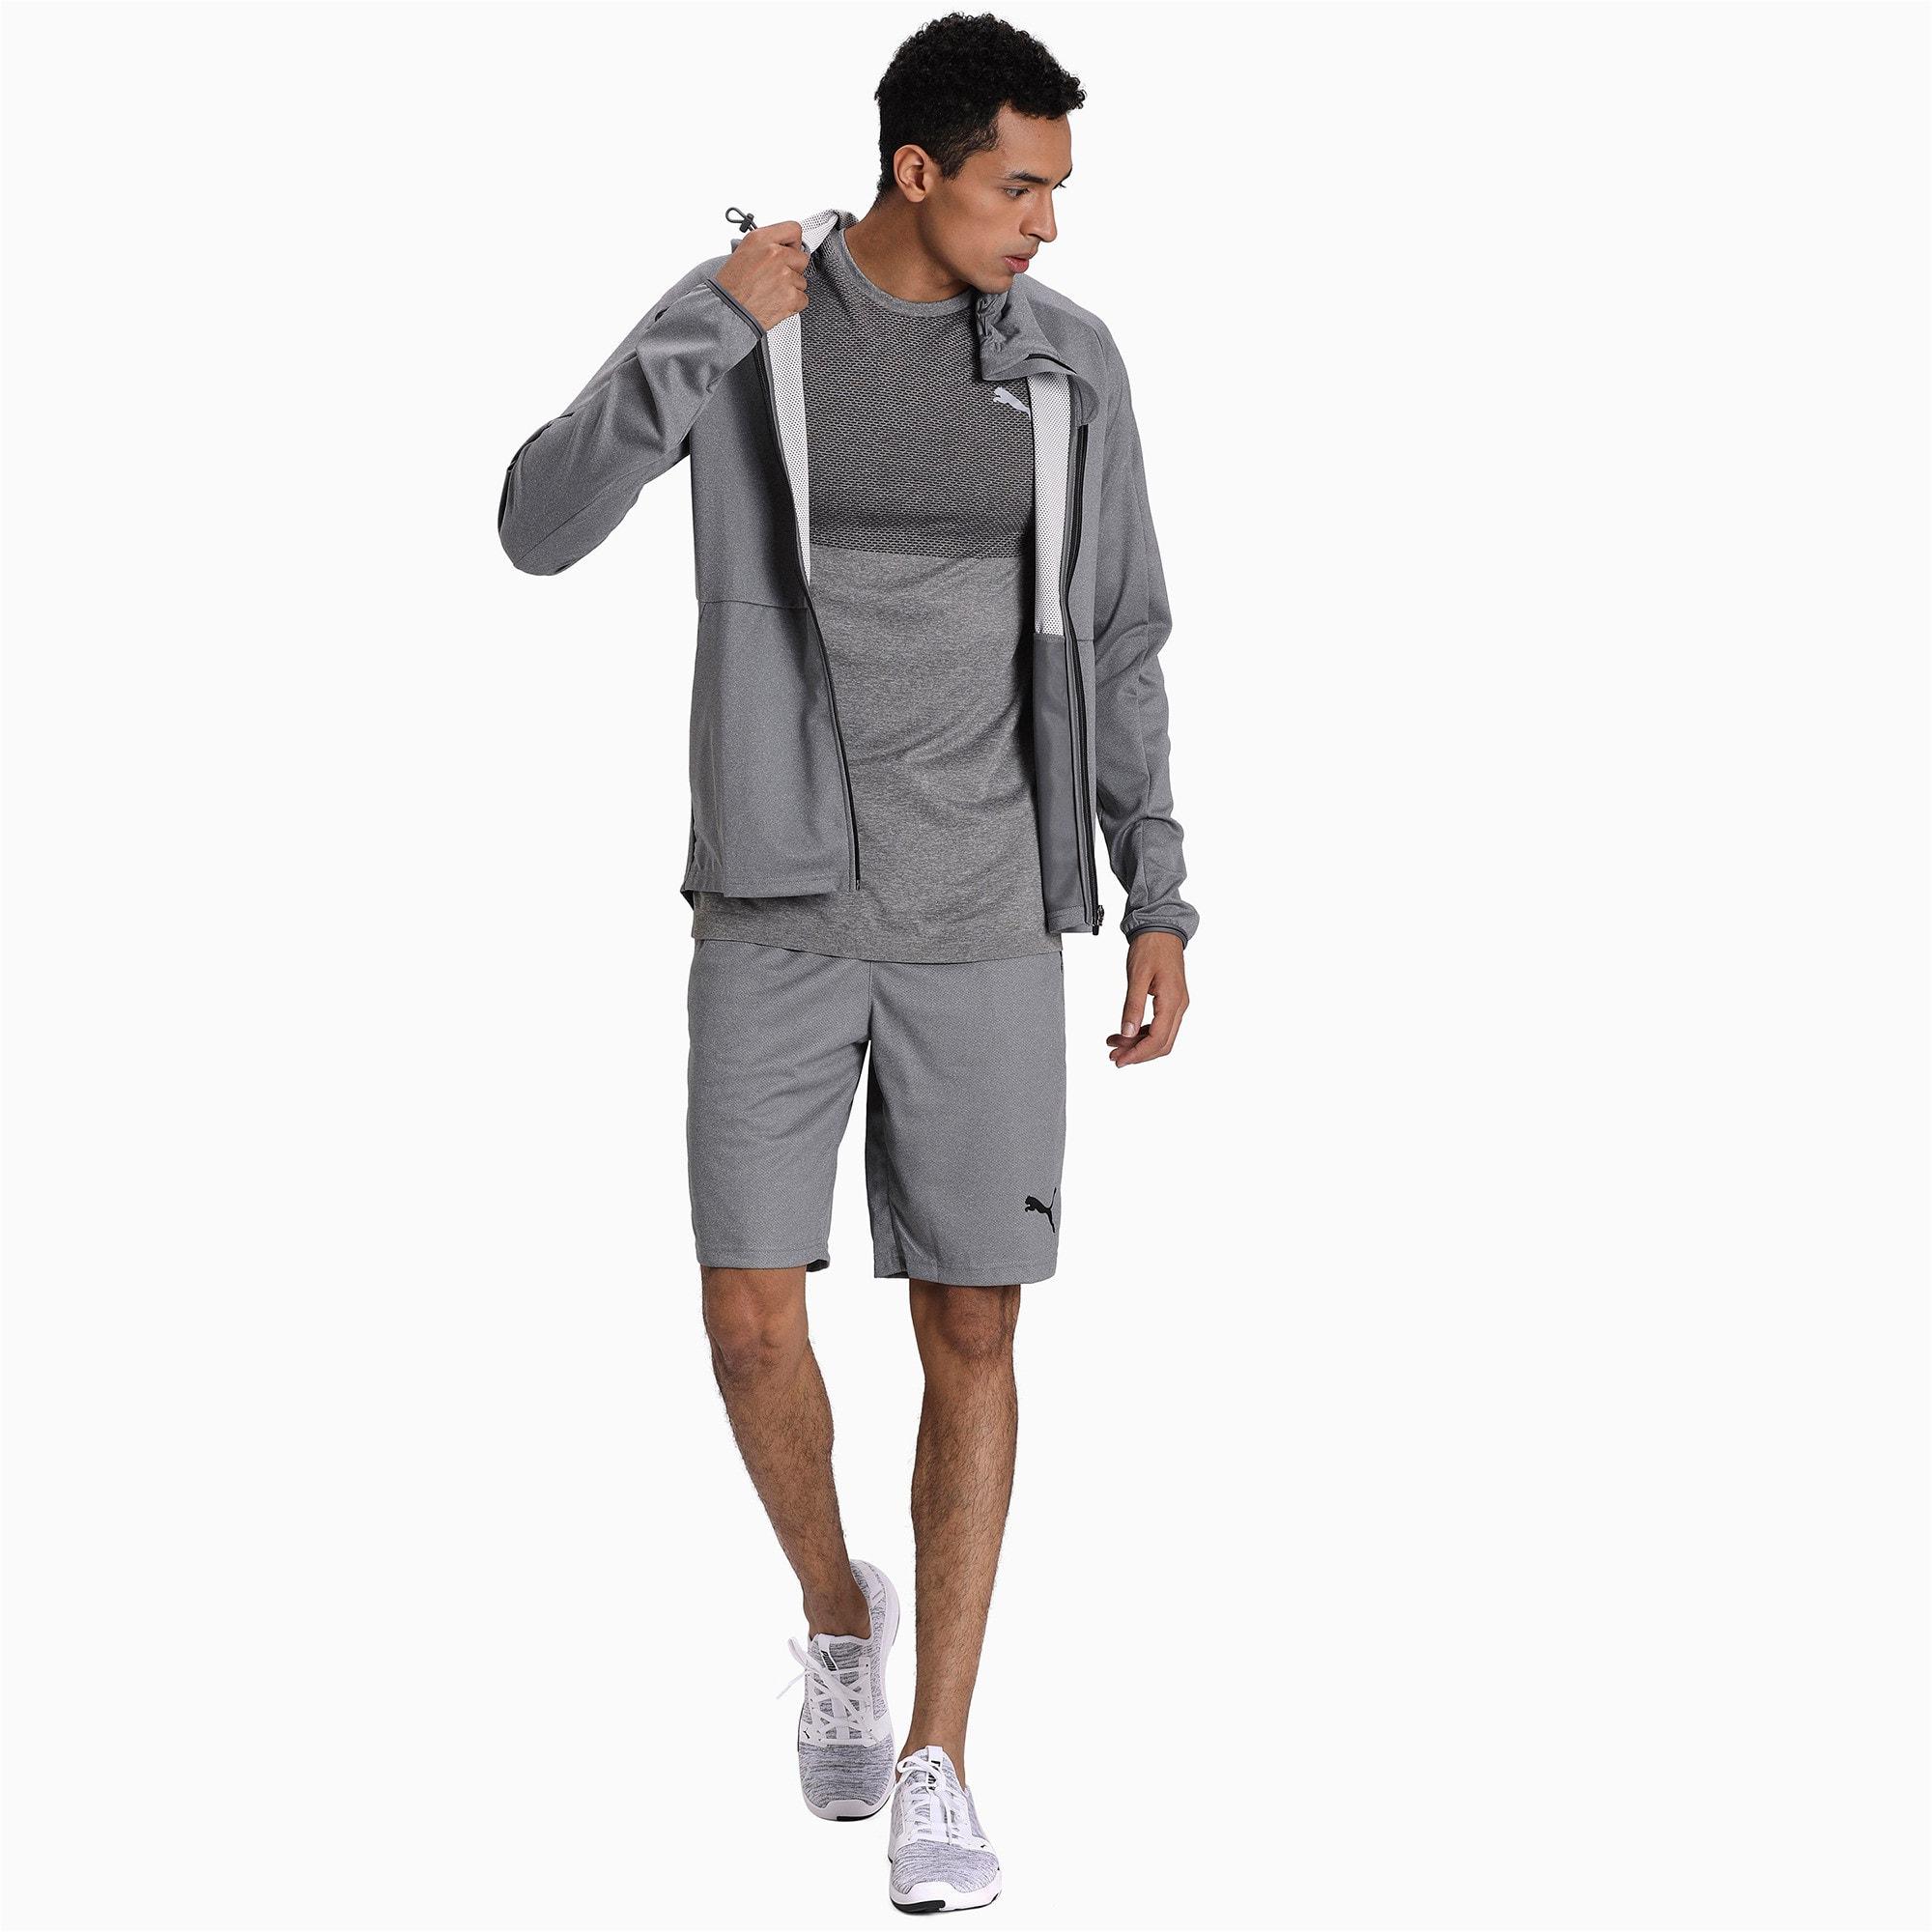 Thumbnail 3 of Tec Sports Full Zip Men's Hoodie, Medium Gray Heather, medium-IND